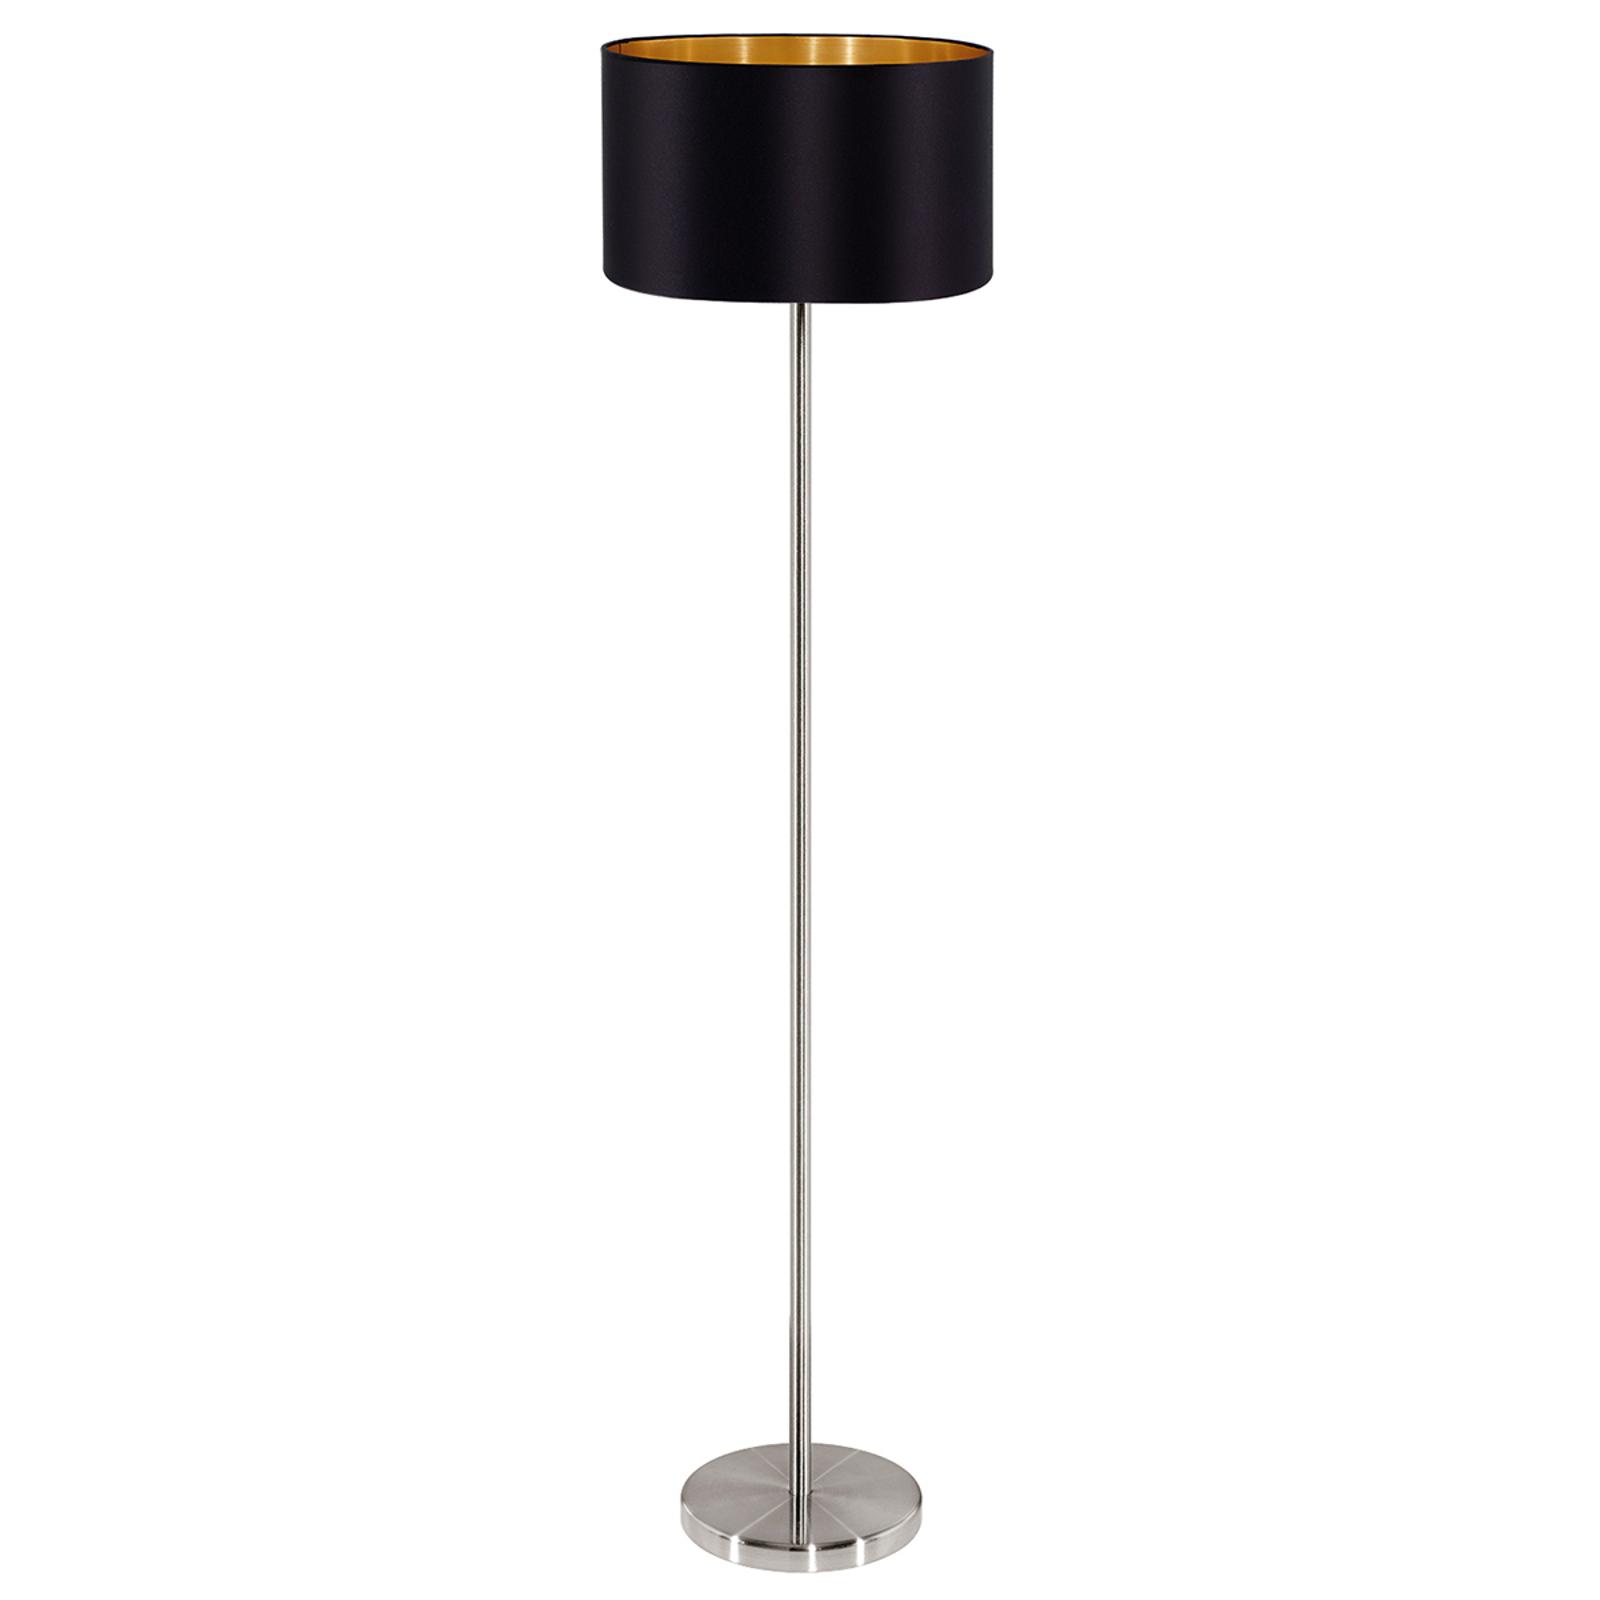 Szlachetna tekstylna lampa stojąca Maserlo